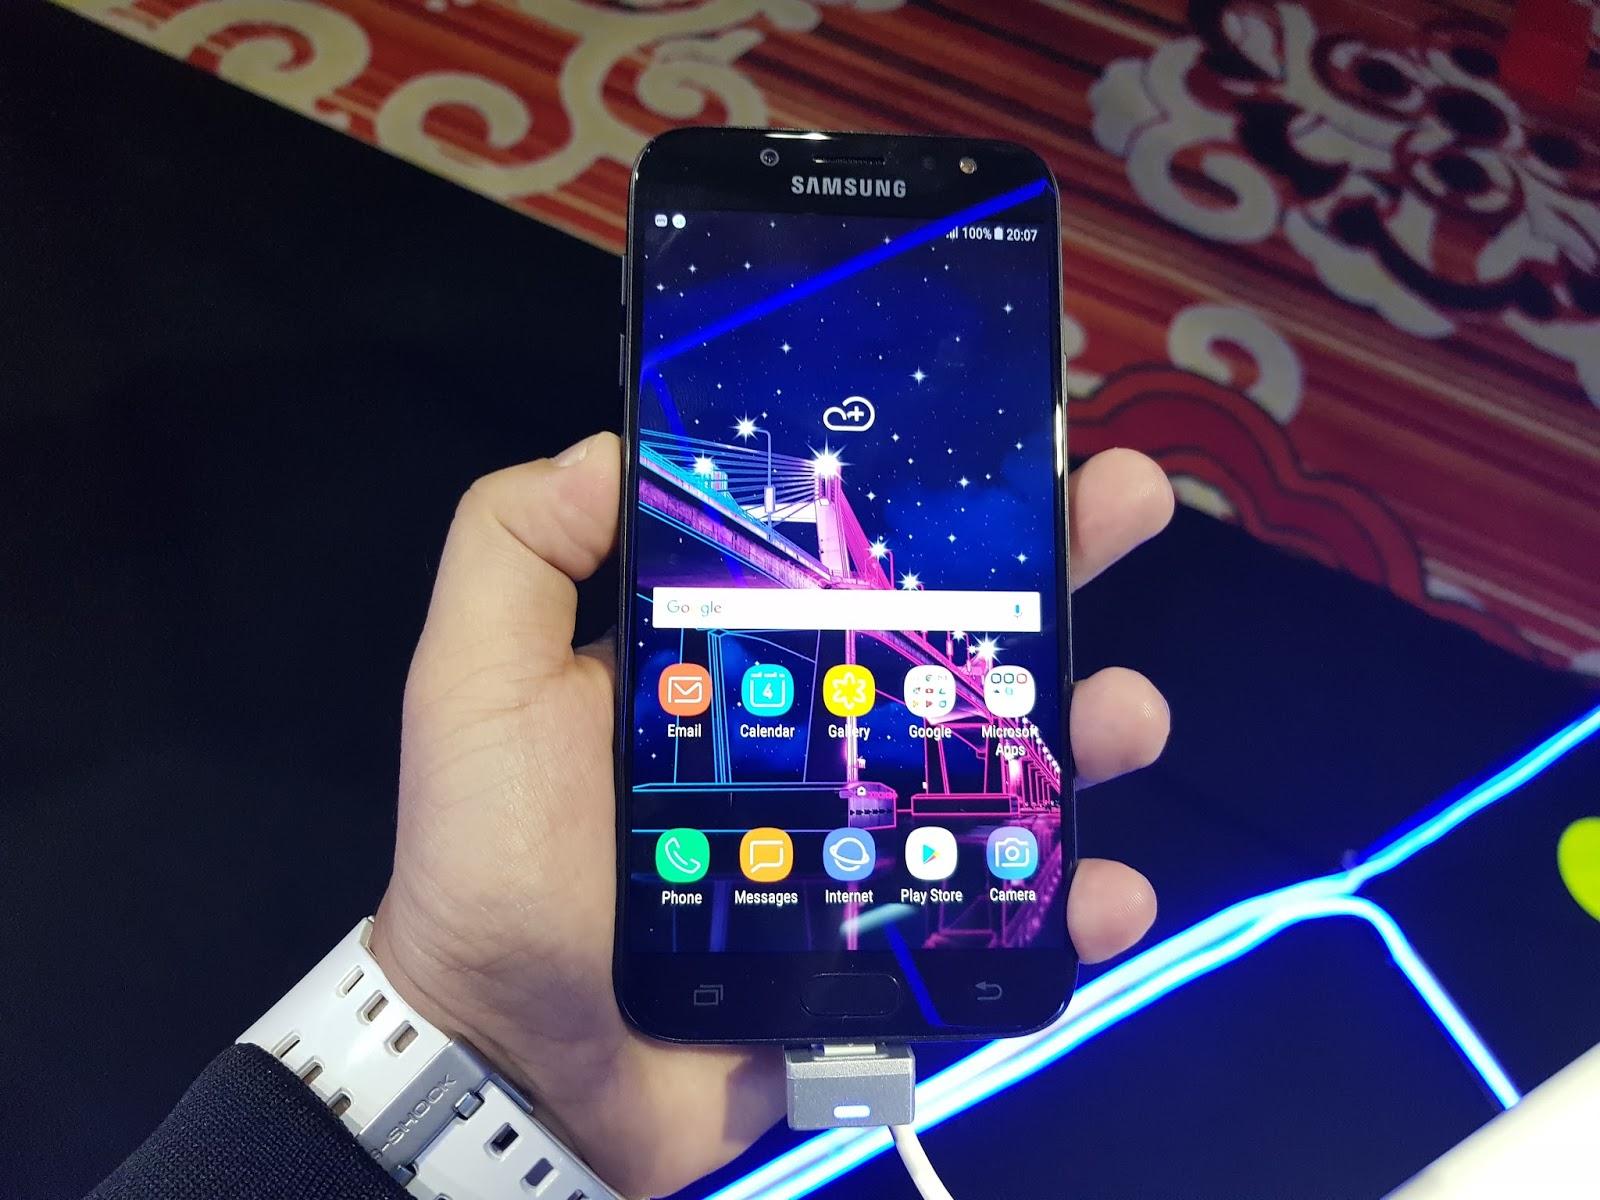 J7 Samsung Galaxy Pro Price Philippines Samsung J7 Pro Specs And Price Philippines 1600x1200 Wallpaper Teahub Io